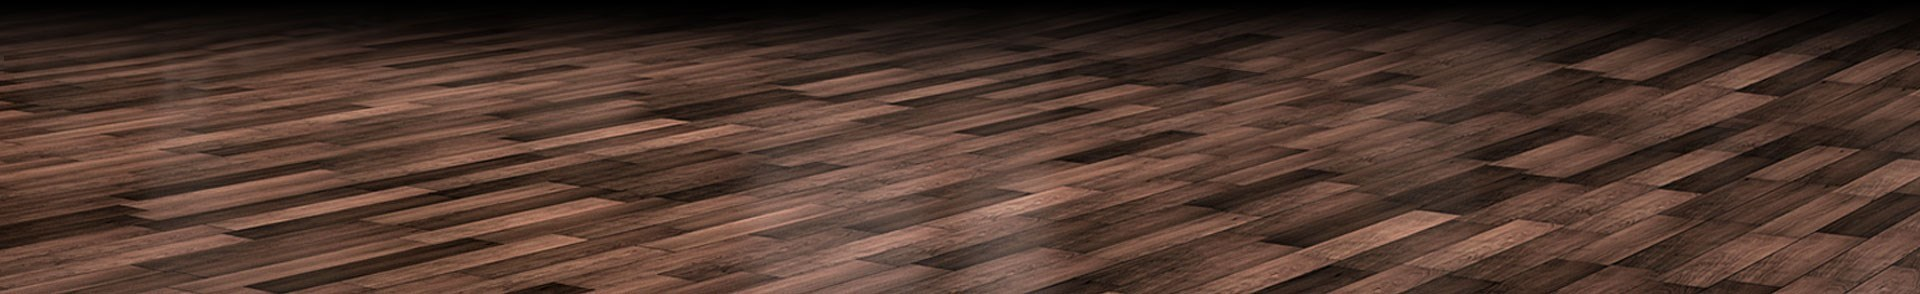 Adore Floors S Projectflor, Zebrano Laminate Flooring Homebase